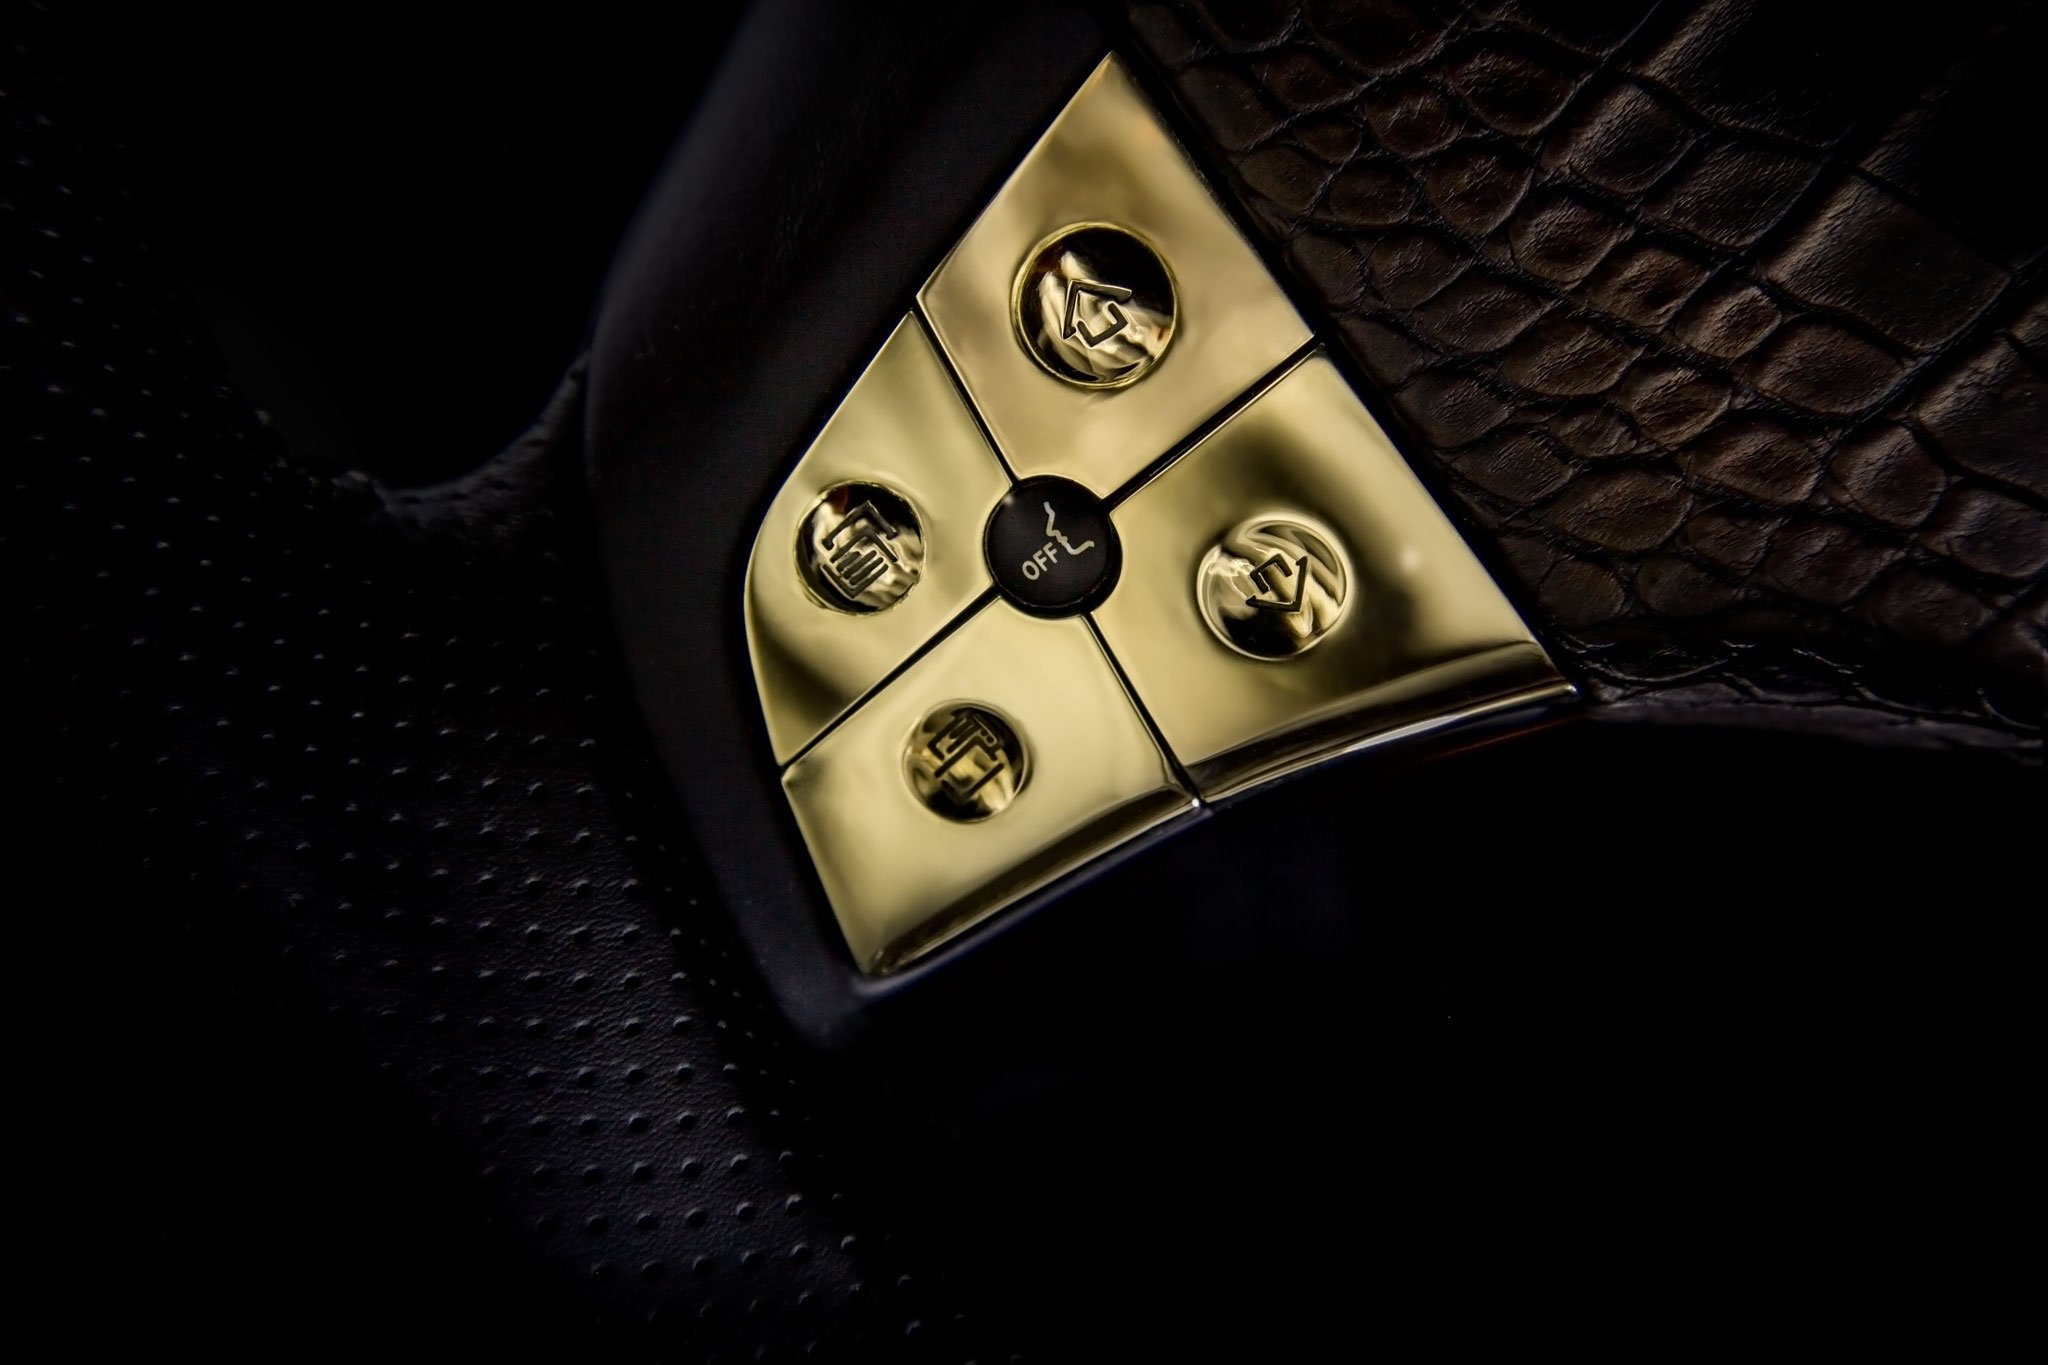 DARTZ_Prombron_Black_Alligatoir_Steering_wheel_buttons_14Kgold_1